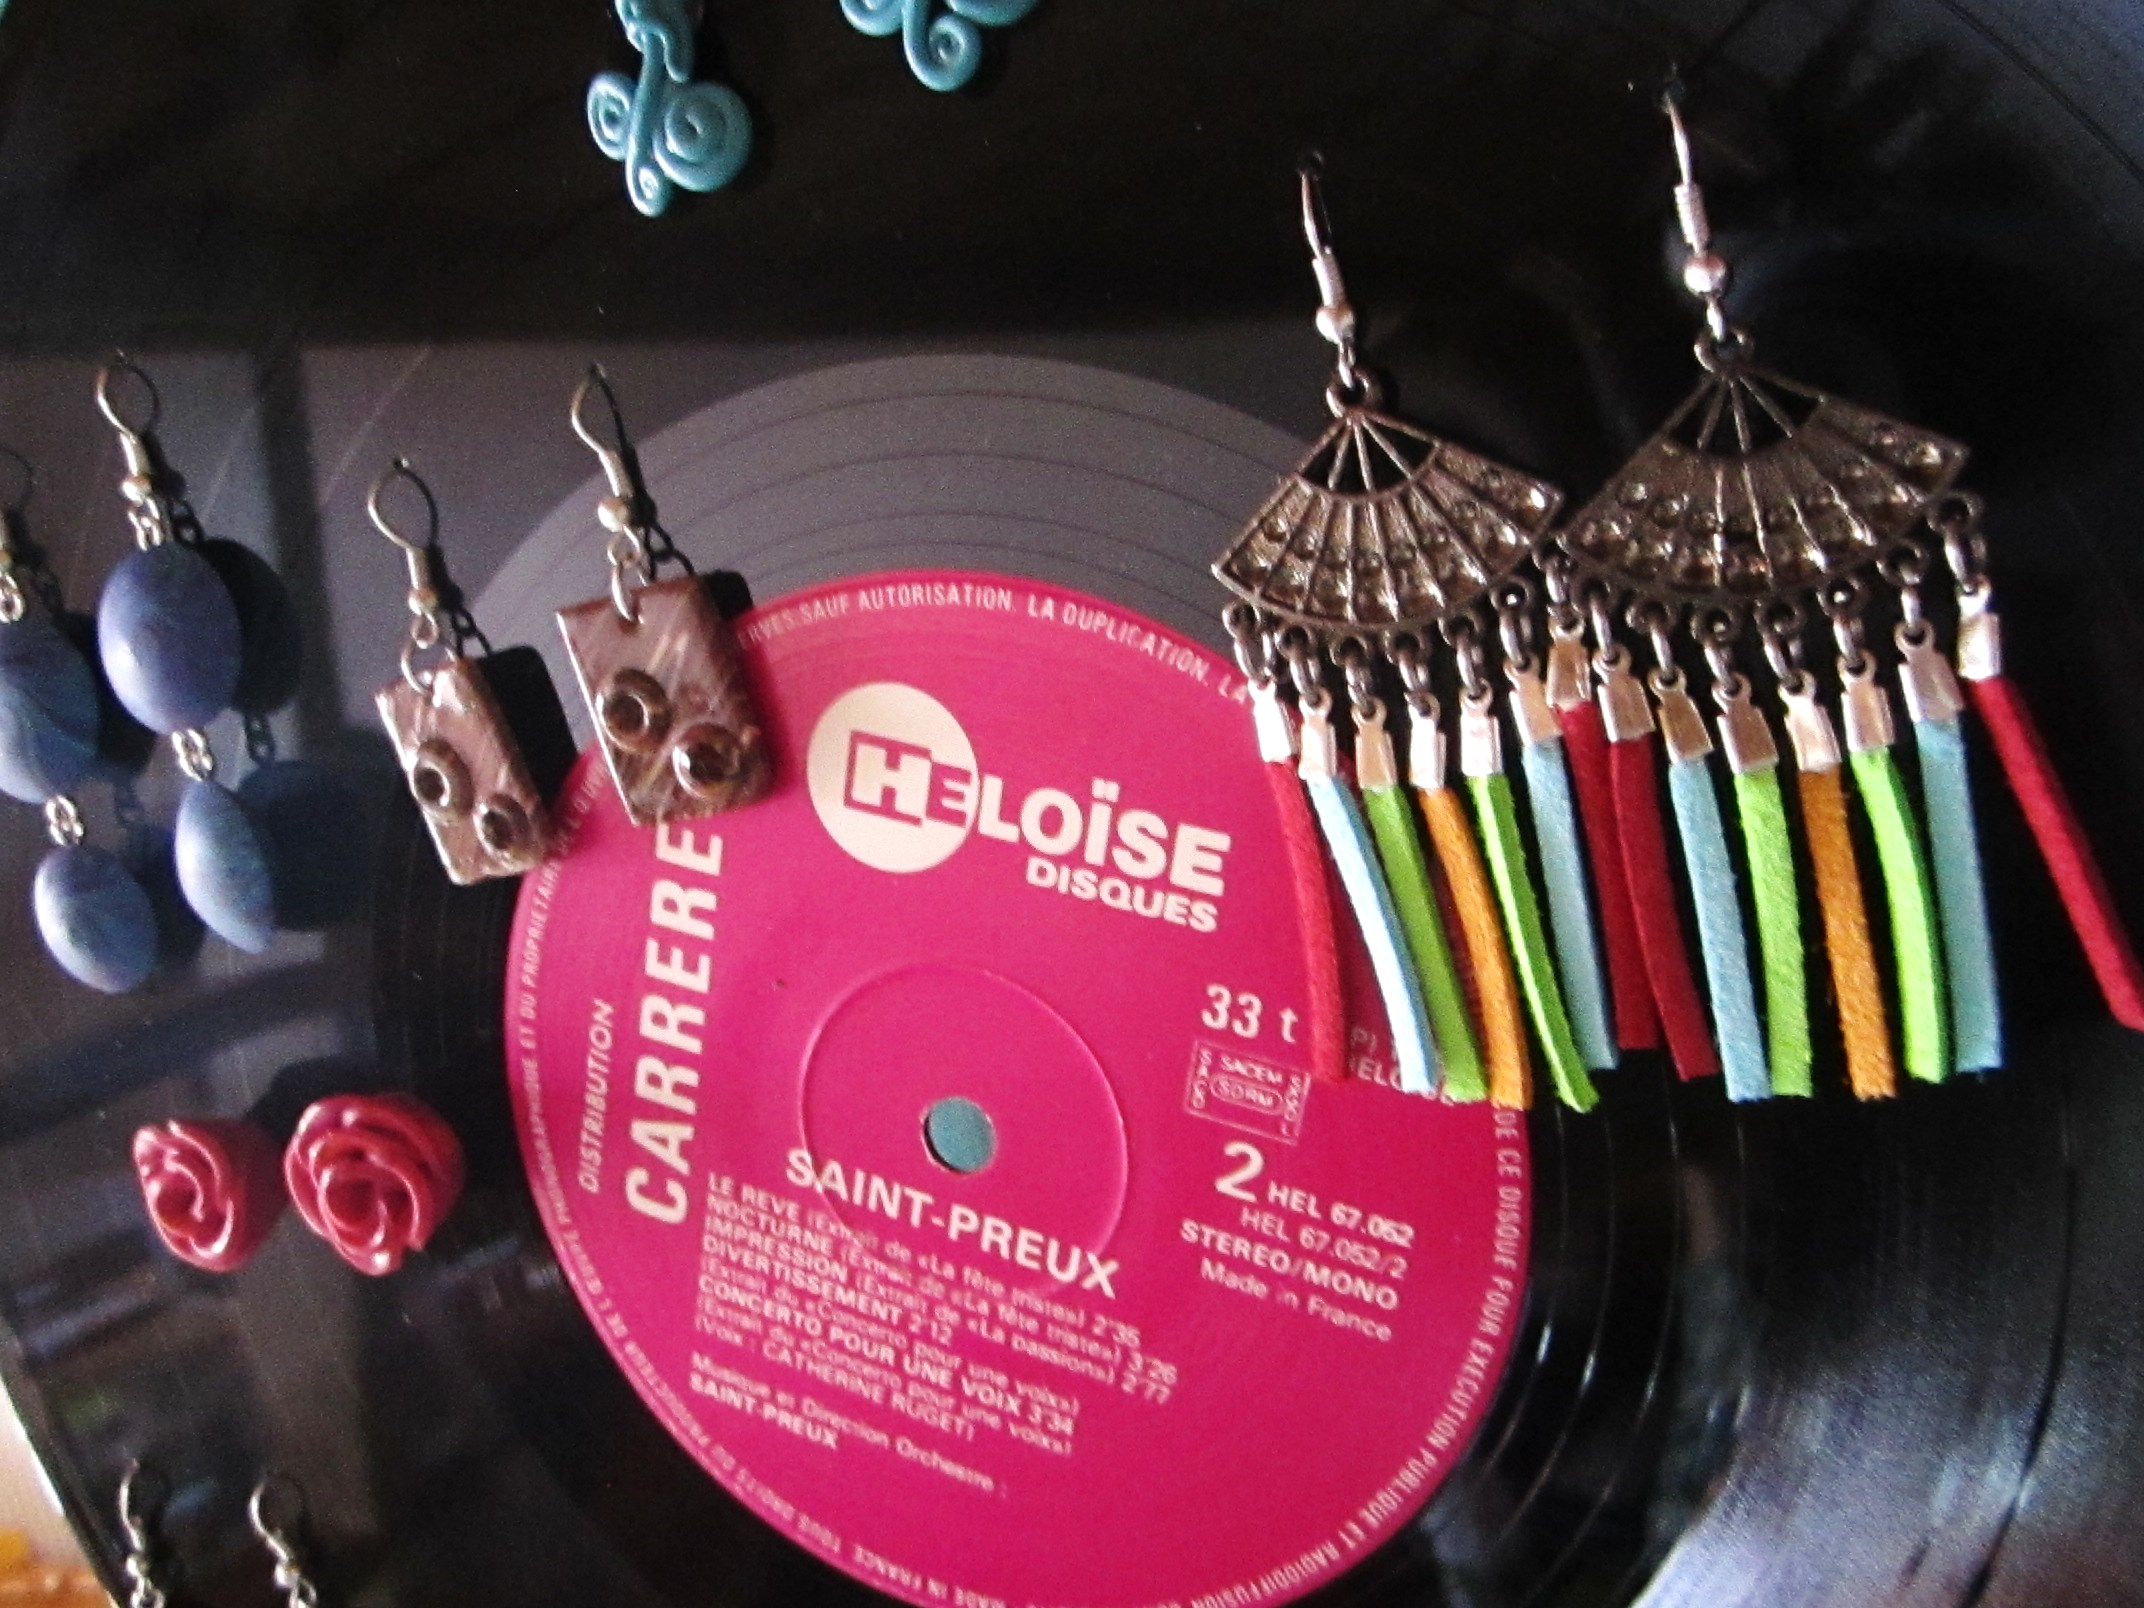 Atelier custom tuto porte bijoux vinyle mixmania - Fabriquer une platine vinyle ...